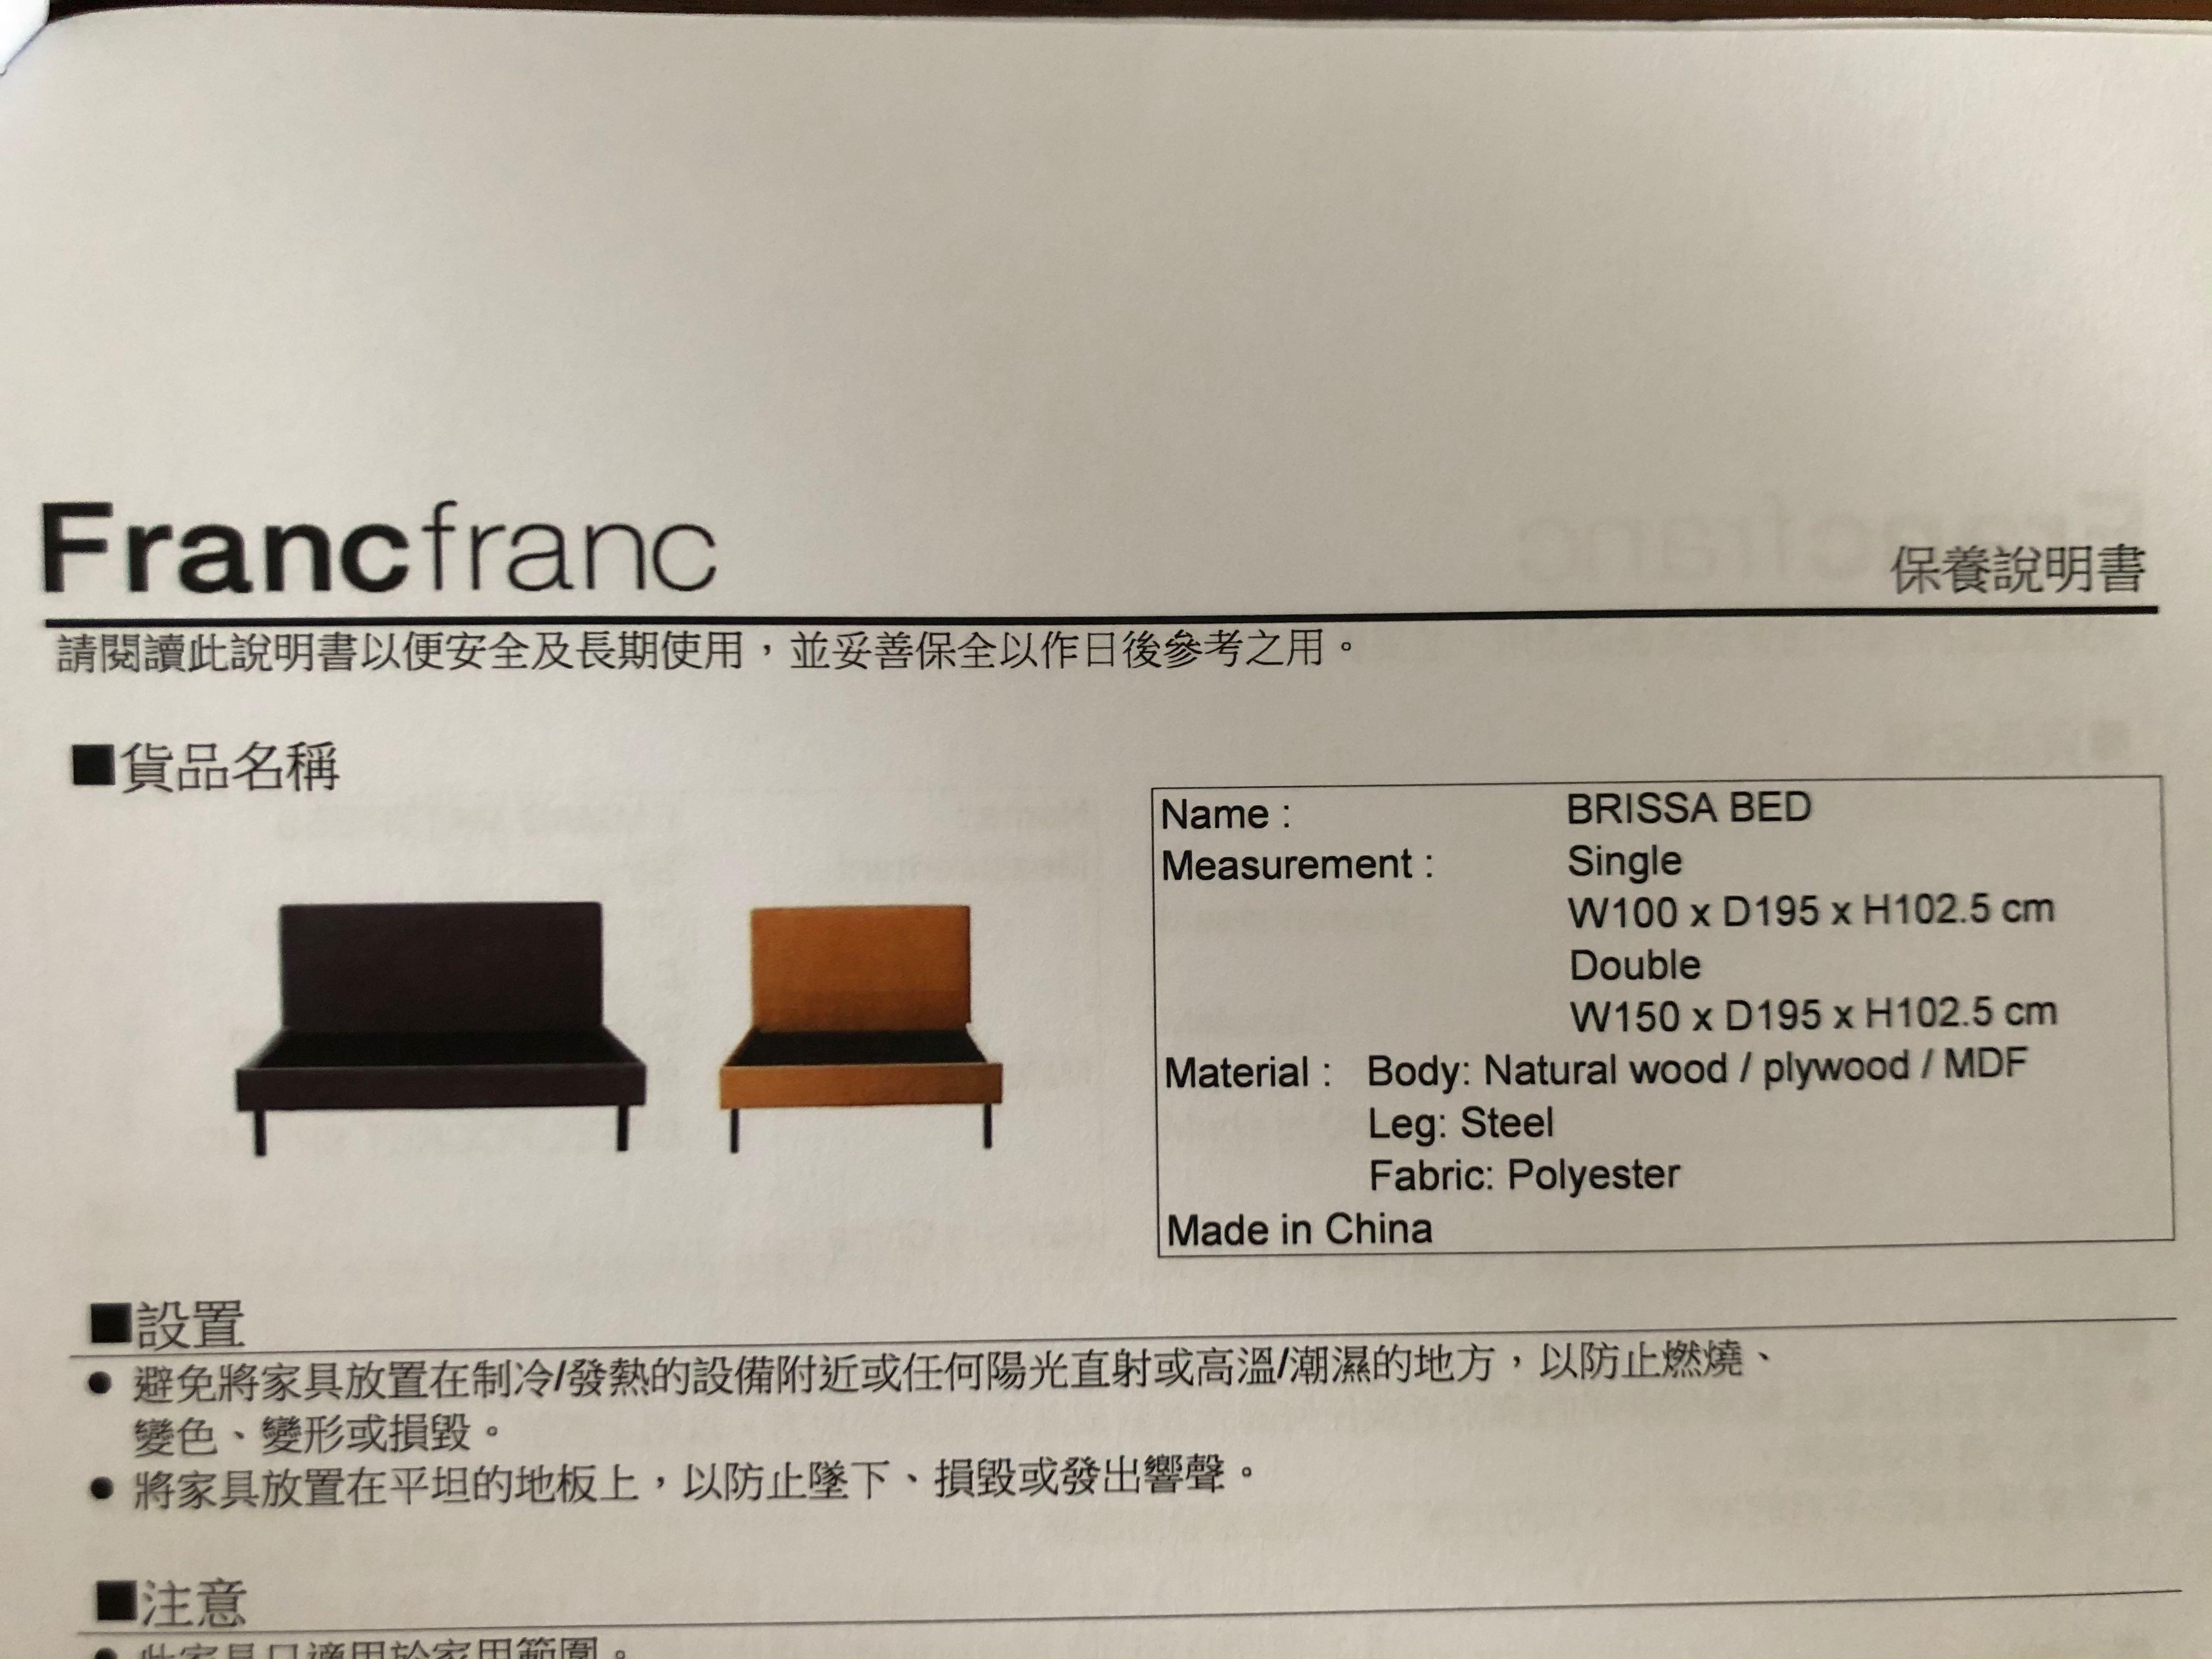 全新日本Francfranc雙人床與澳洲Emmas床褥